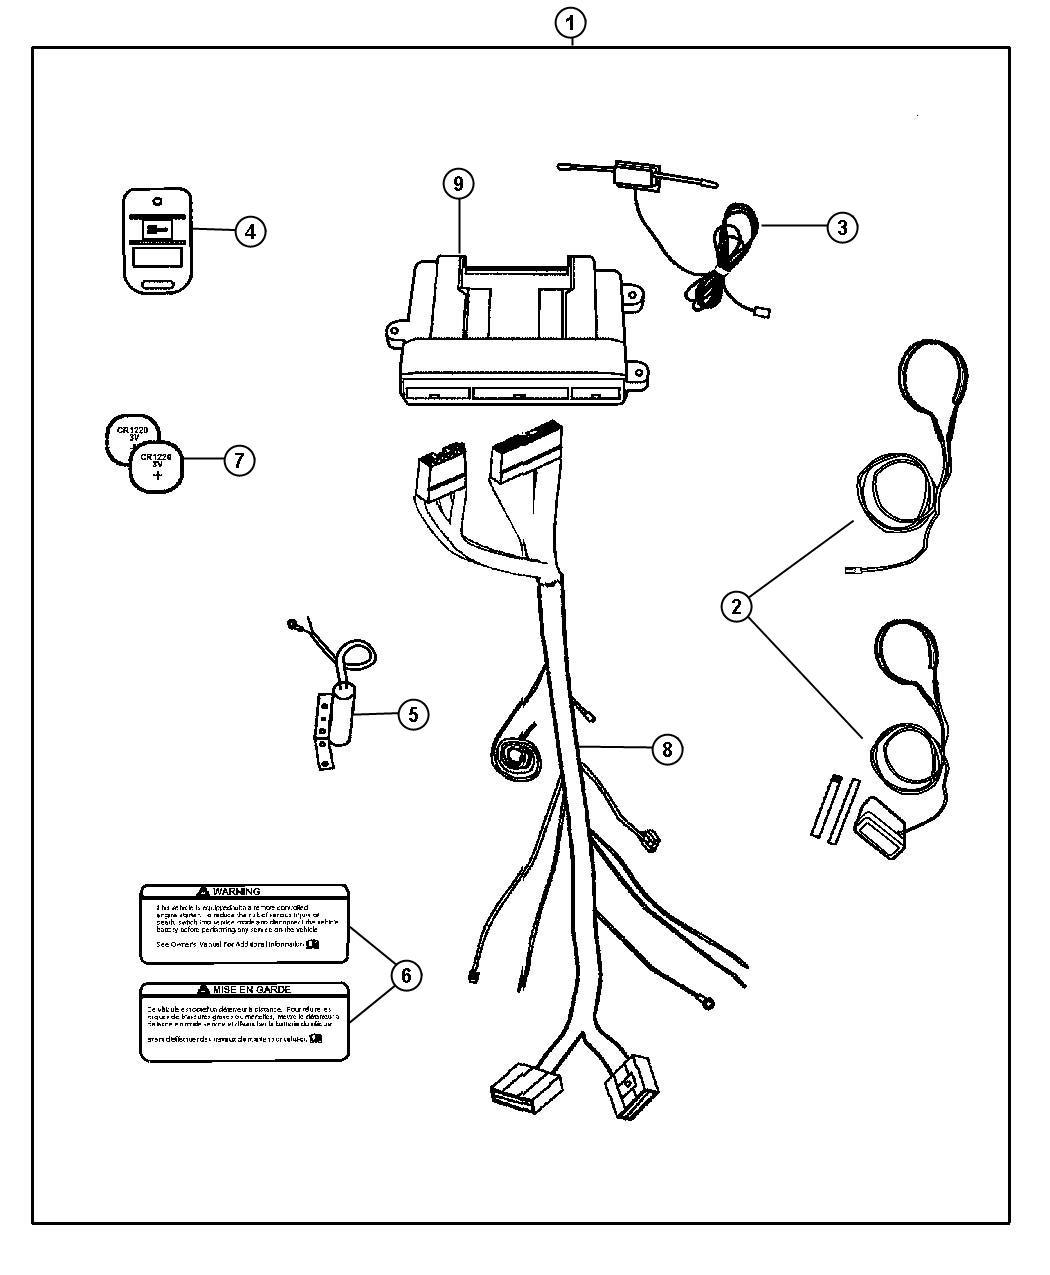 Remote Starter Kit Installation: Software Free Download